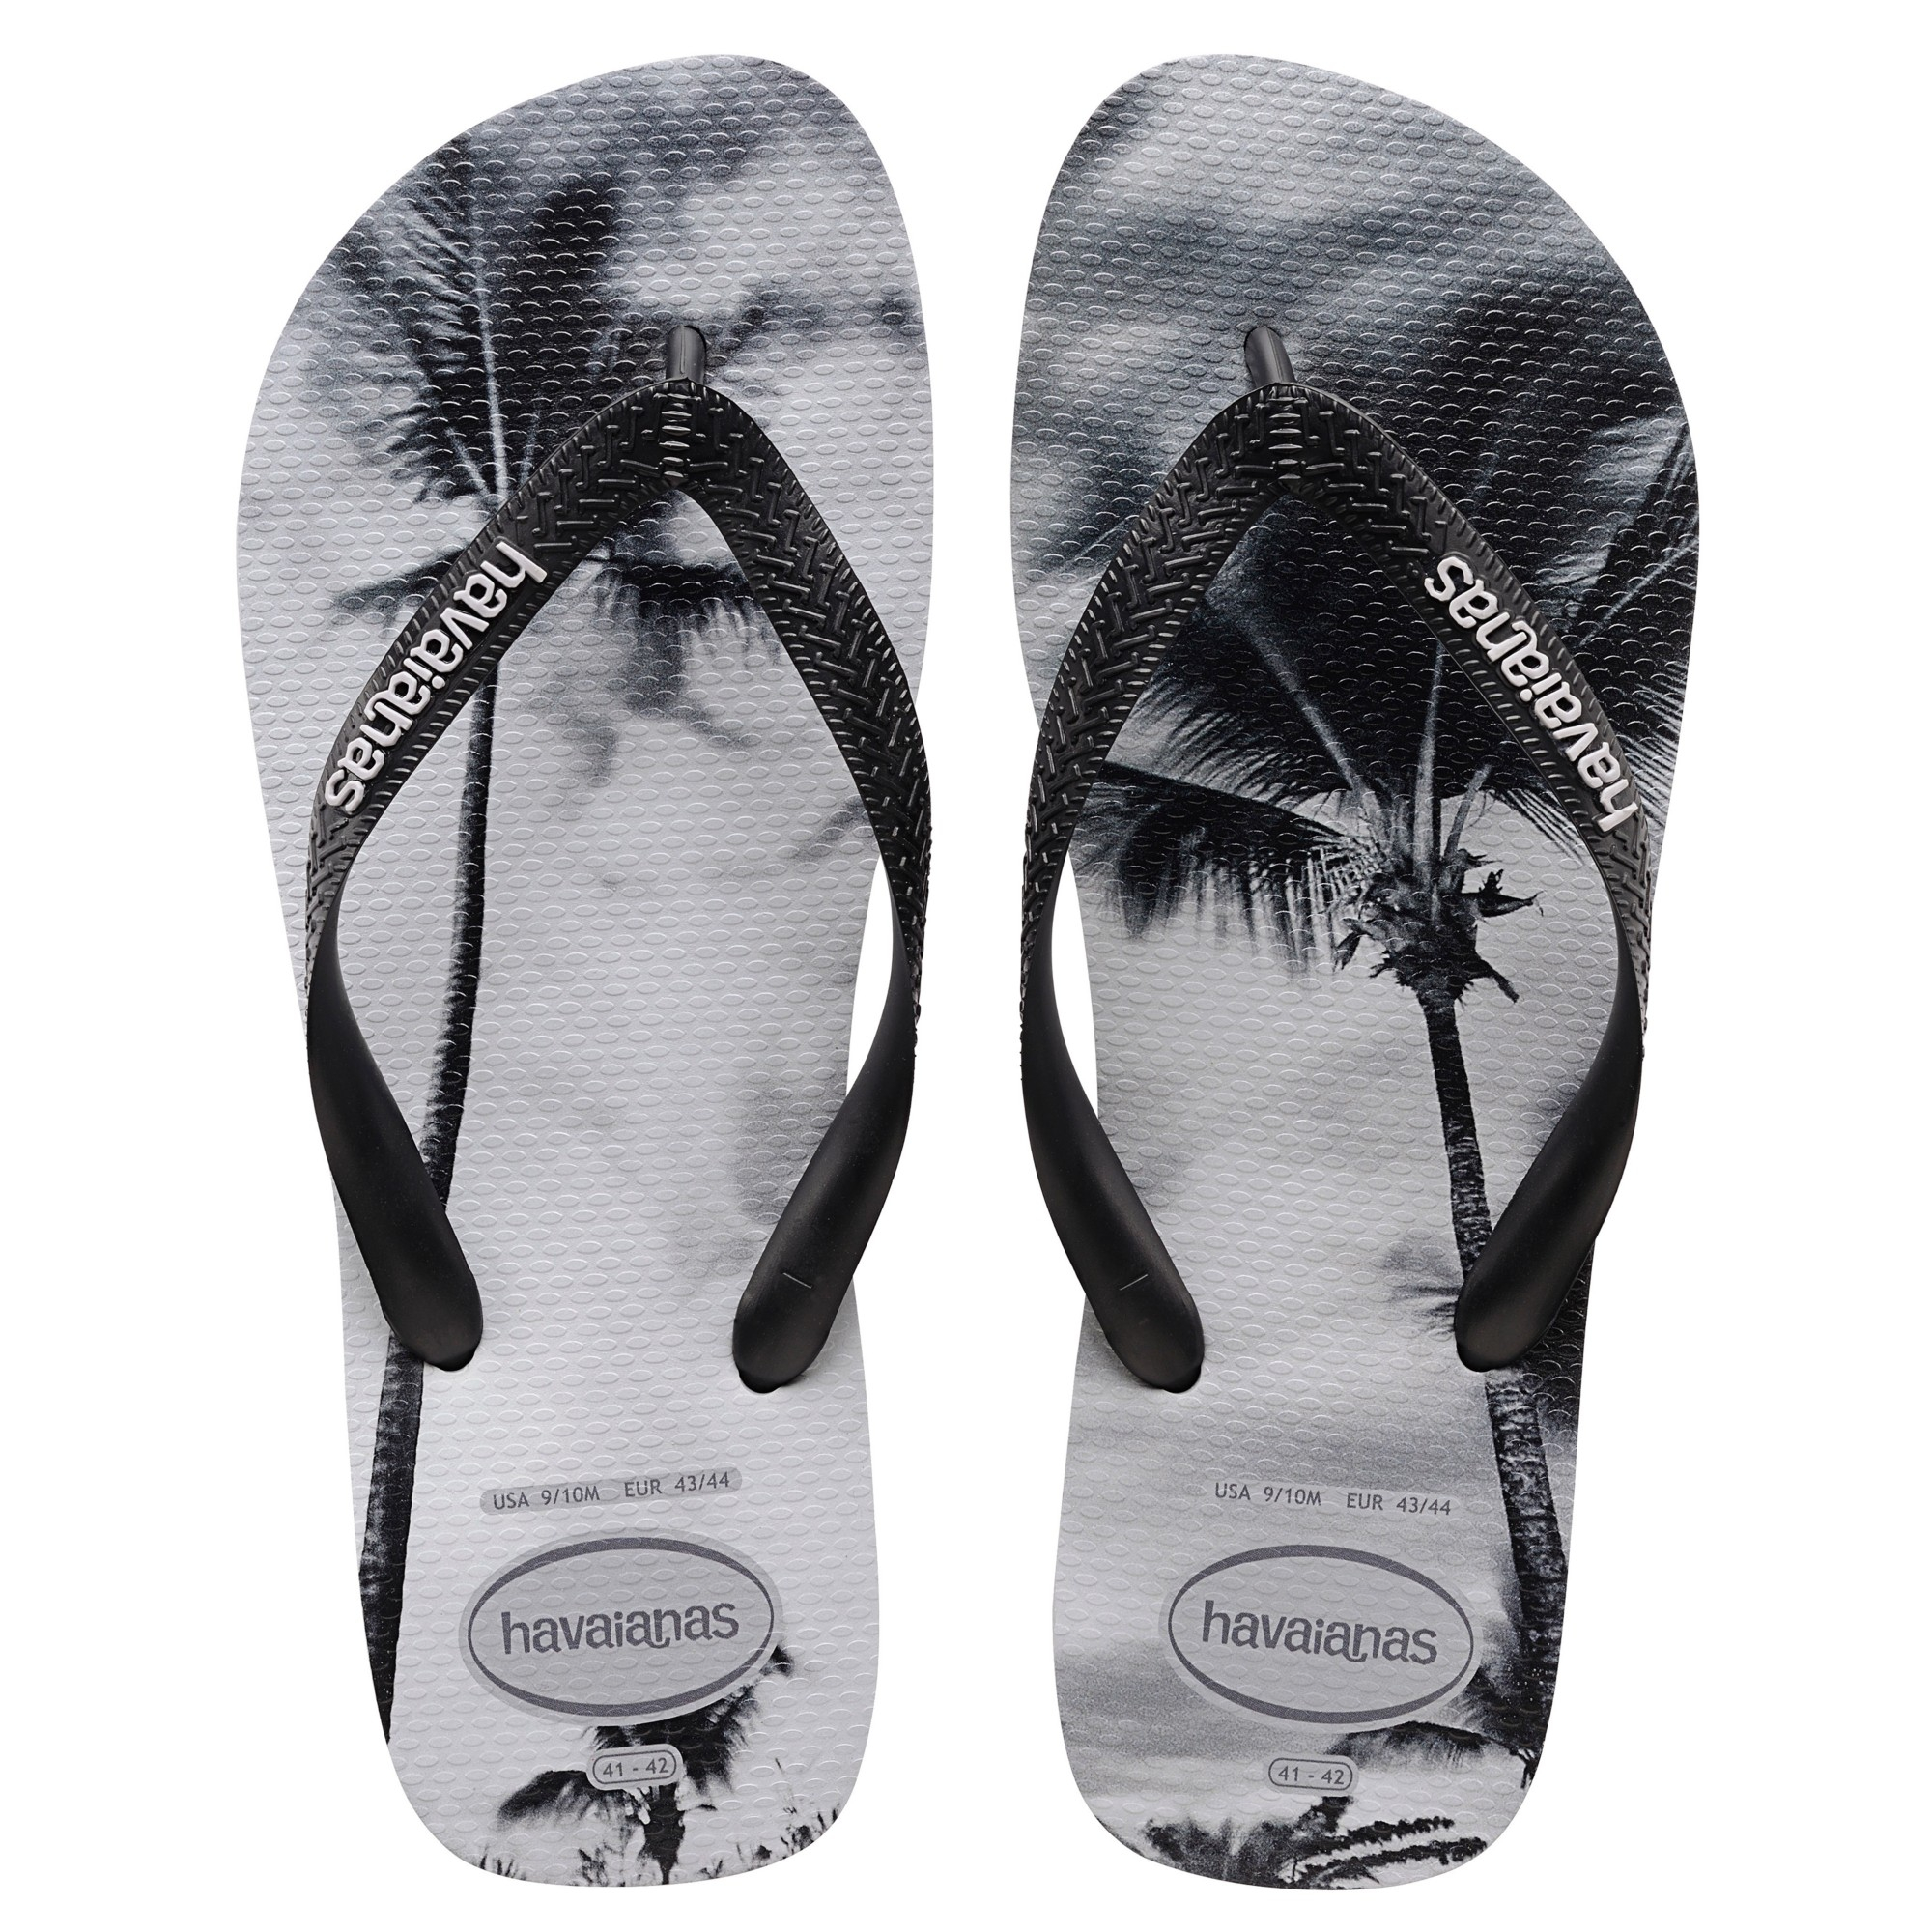 6a41fd0ee439 Havaianas Beach Print Flip Flops in Black for Men - Lyst